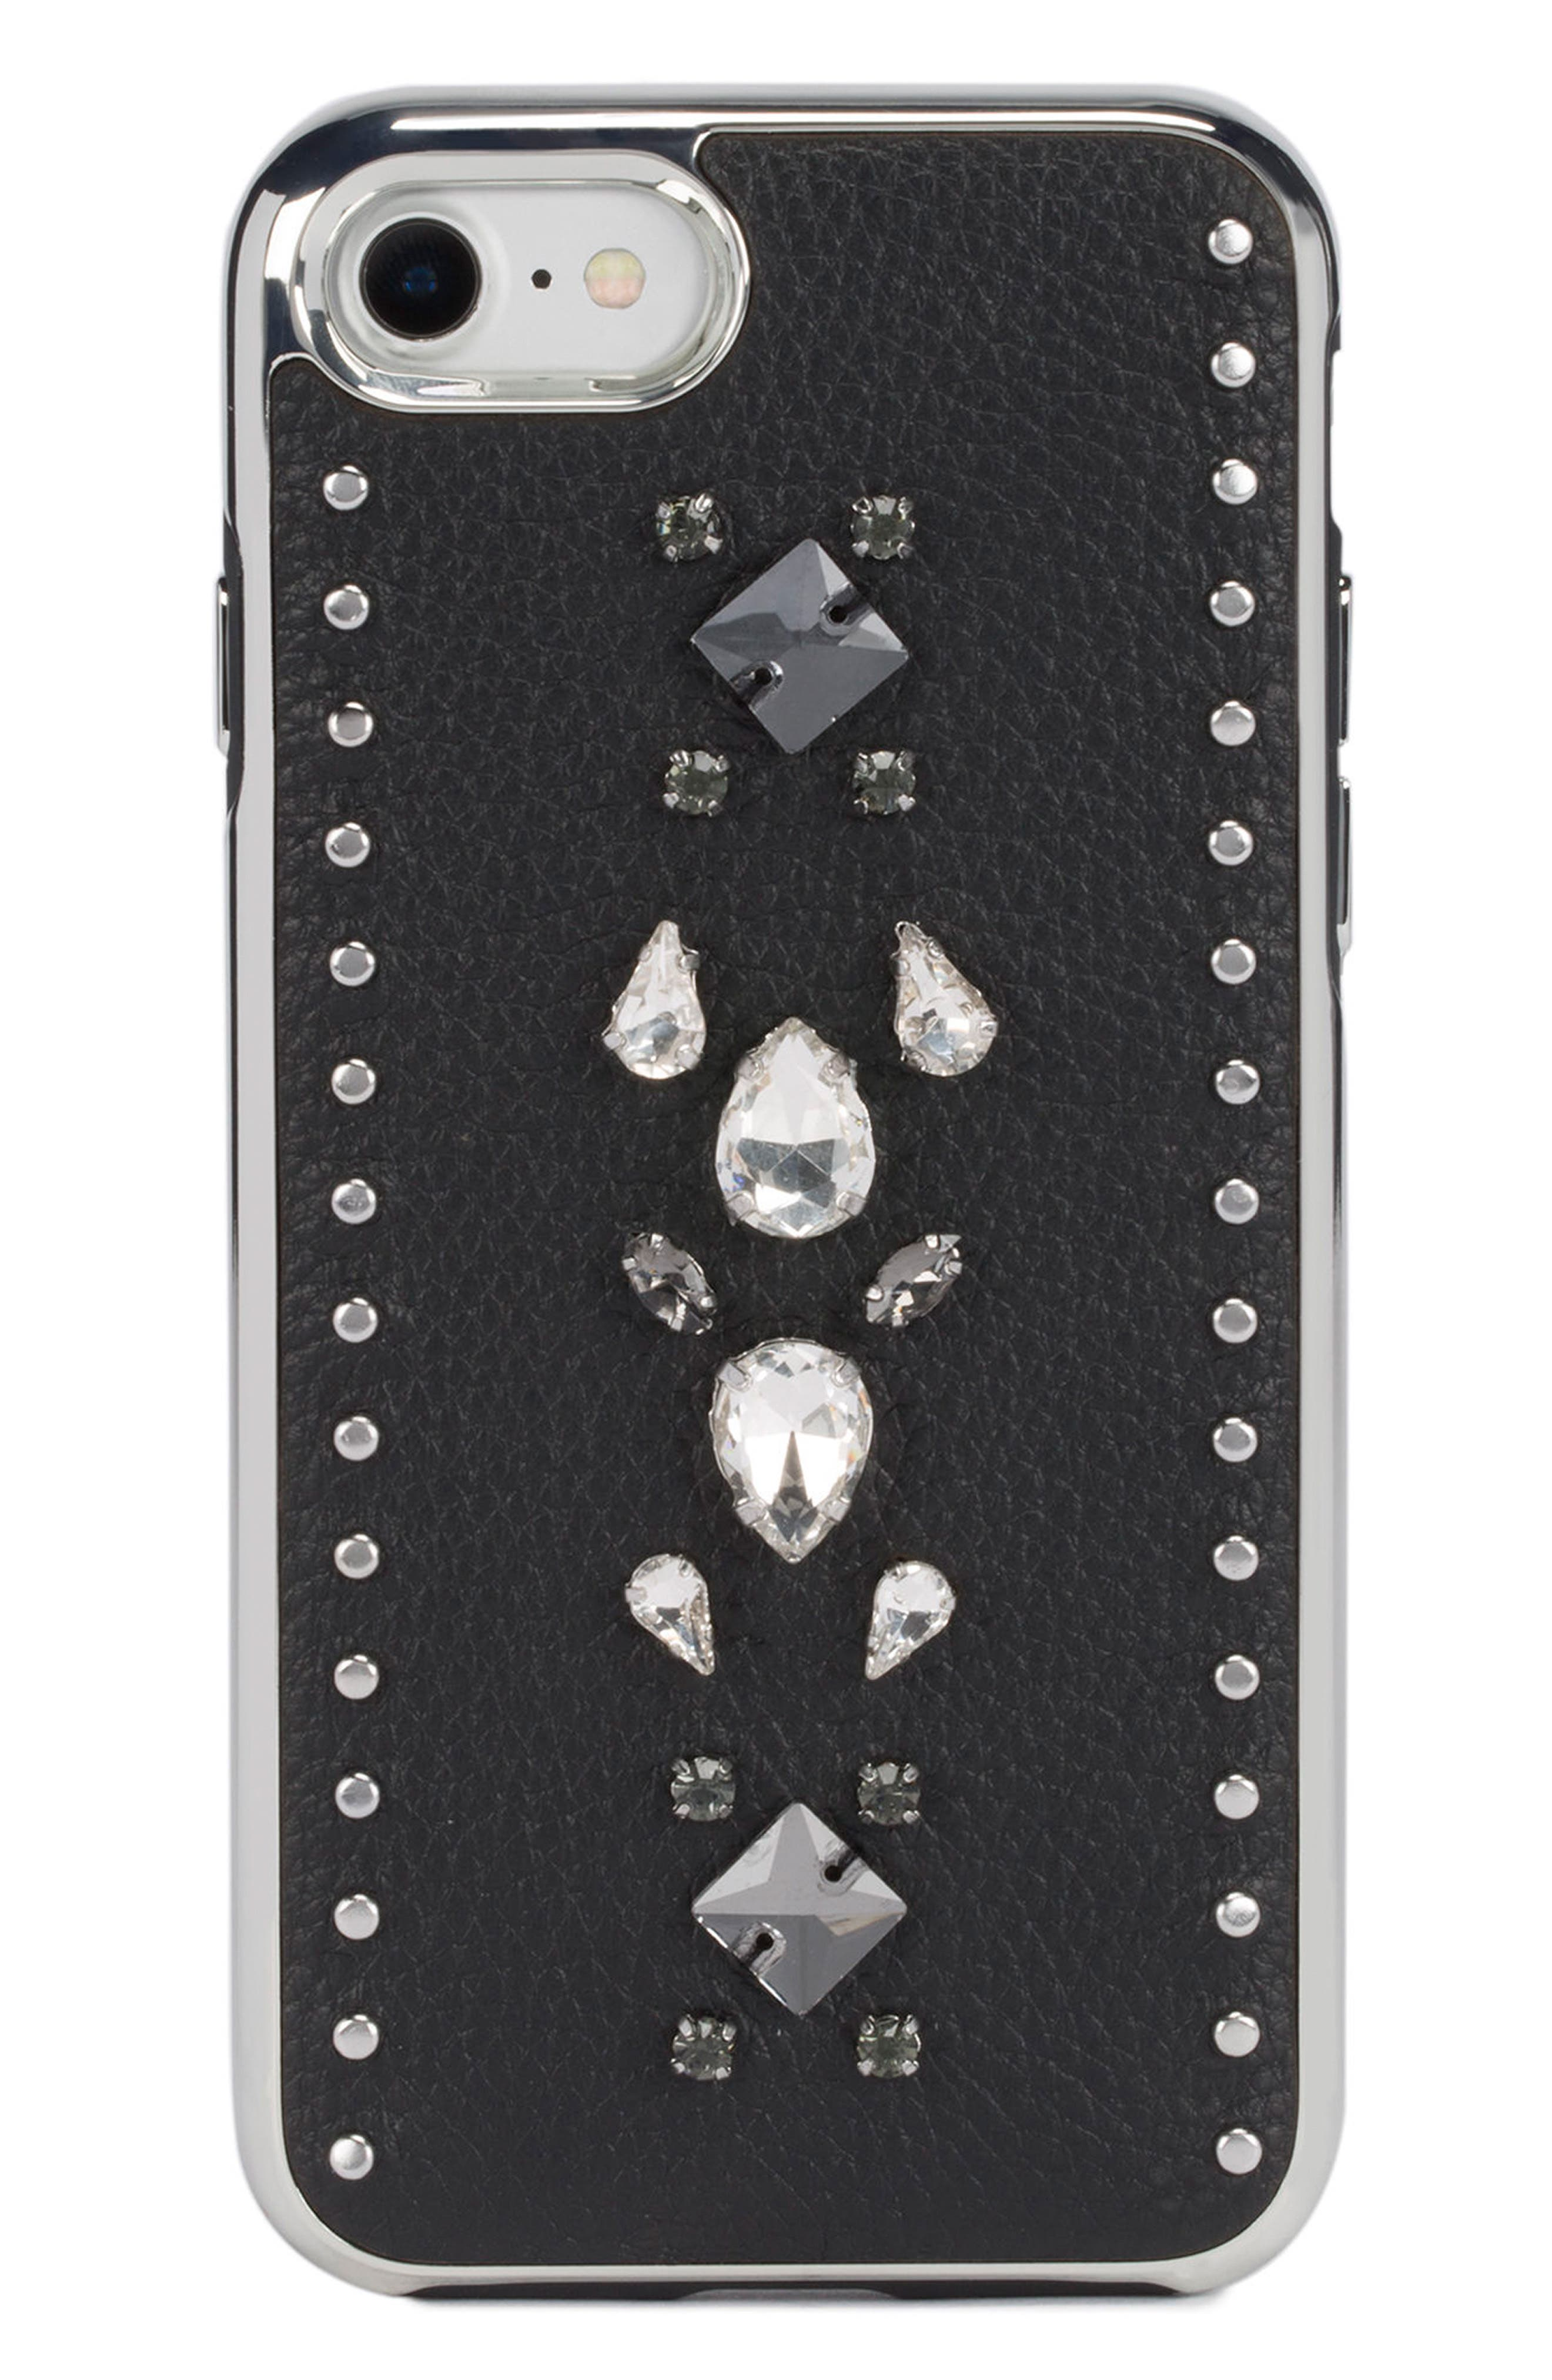 Inlay Gem Leather iPhone 7/8 Plus Case,                         Main,                         color, Multi Gems/ Studs/ Black